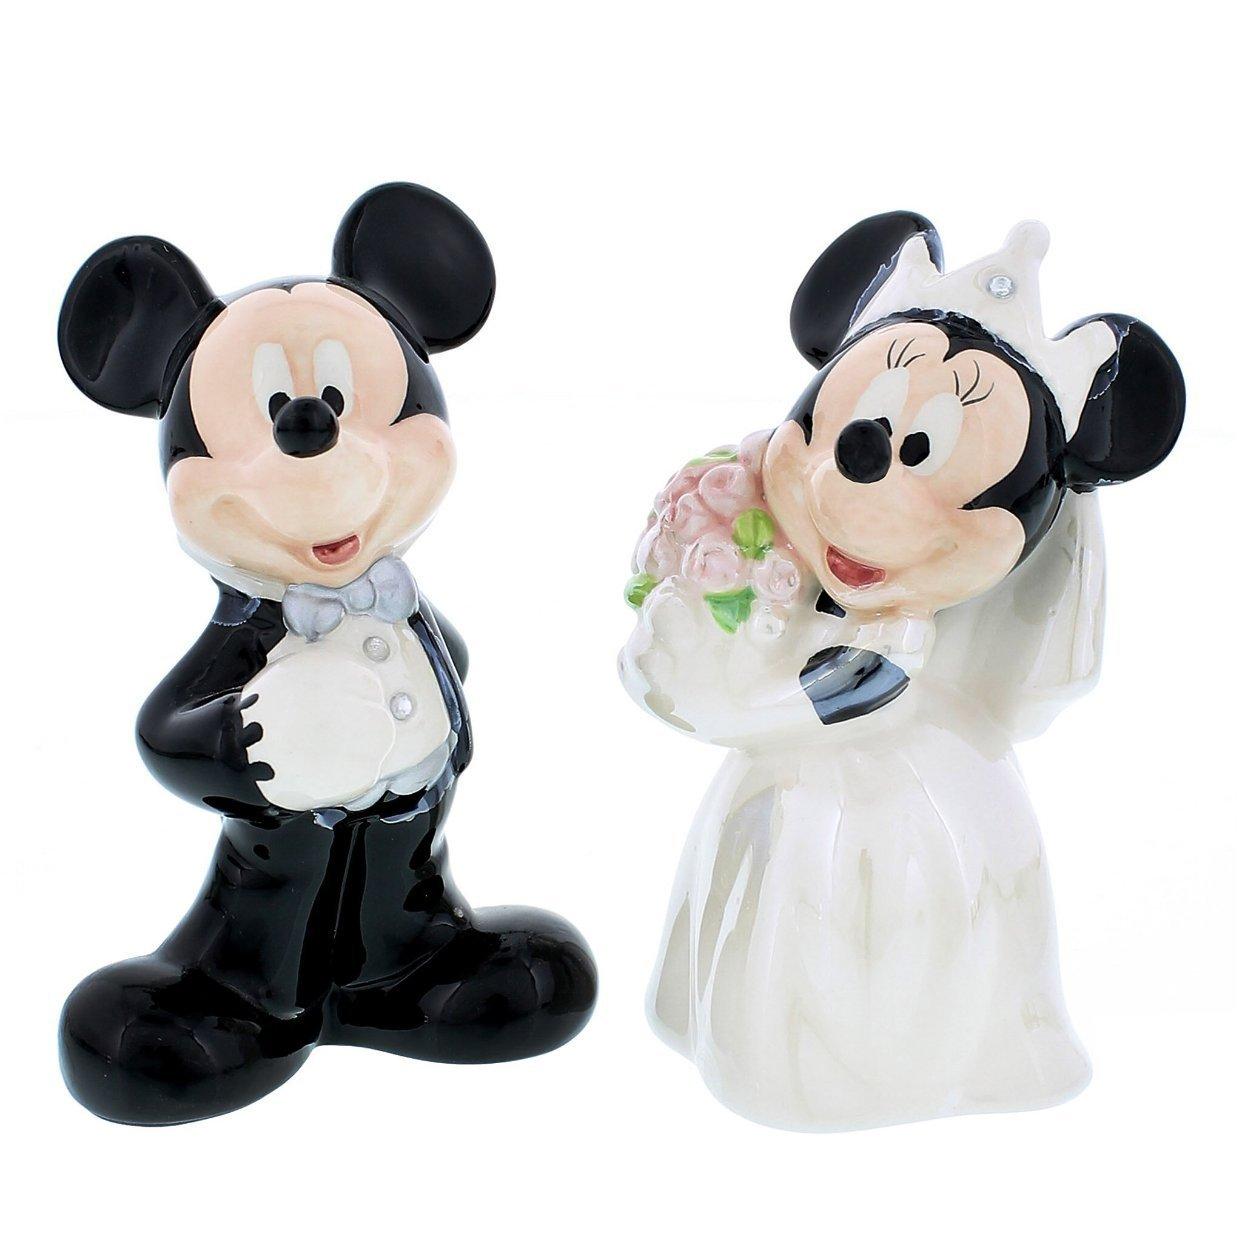 Disney Theme Parks Mickey Minnie Mouse Wedding Salt Pepper 2 Pc. Set Disney Theme Park Merchandise